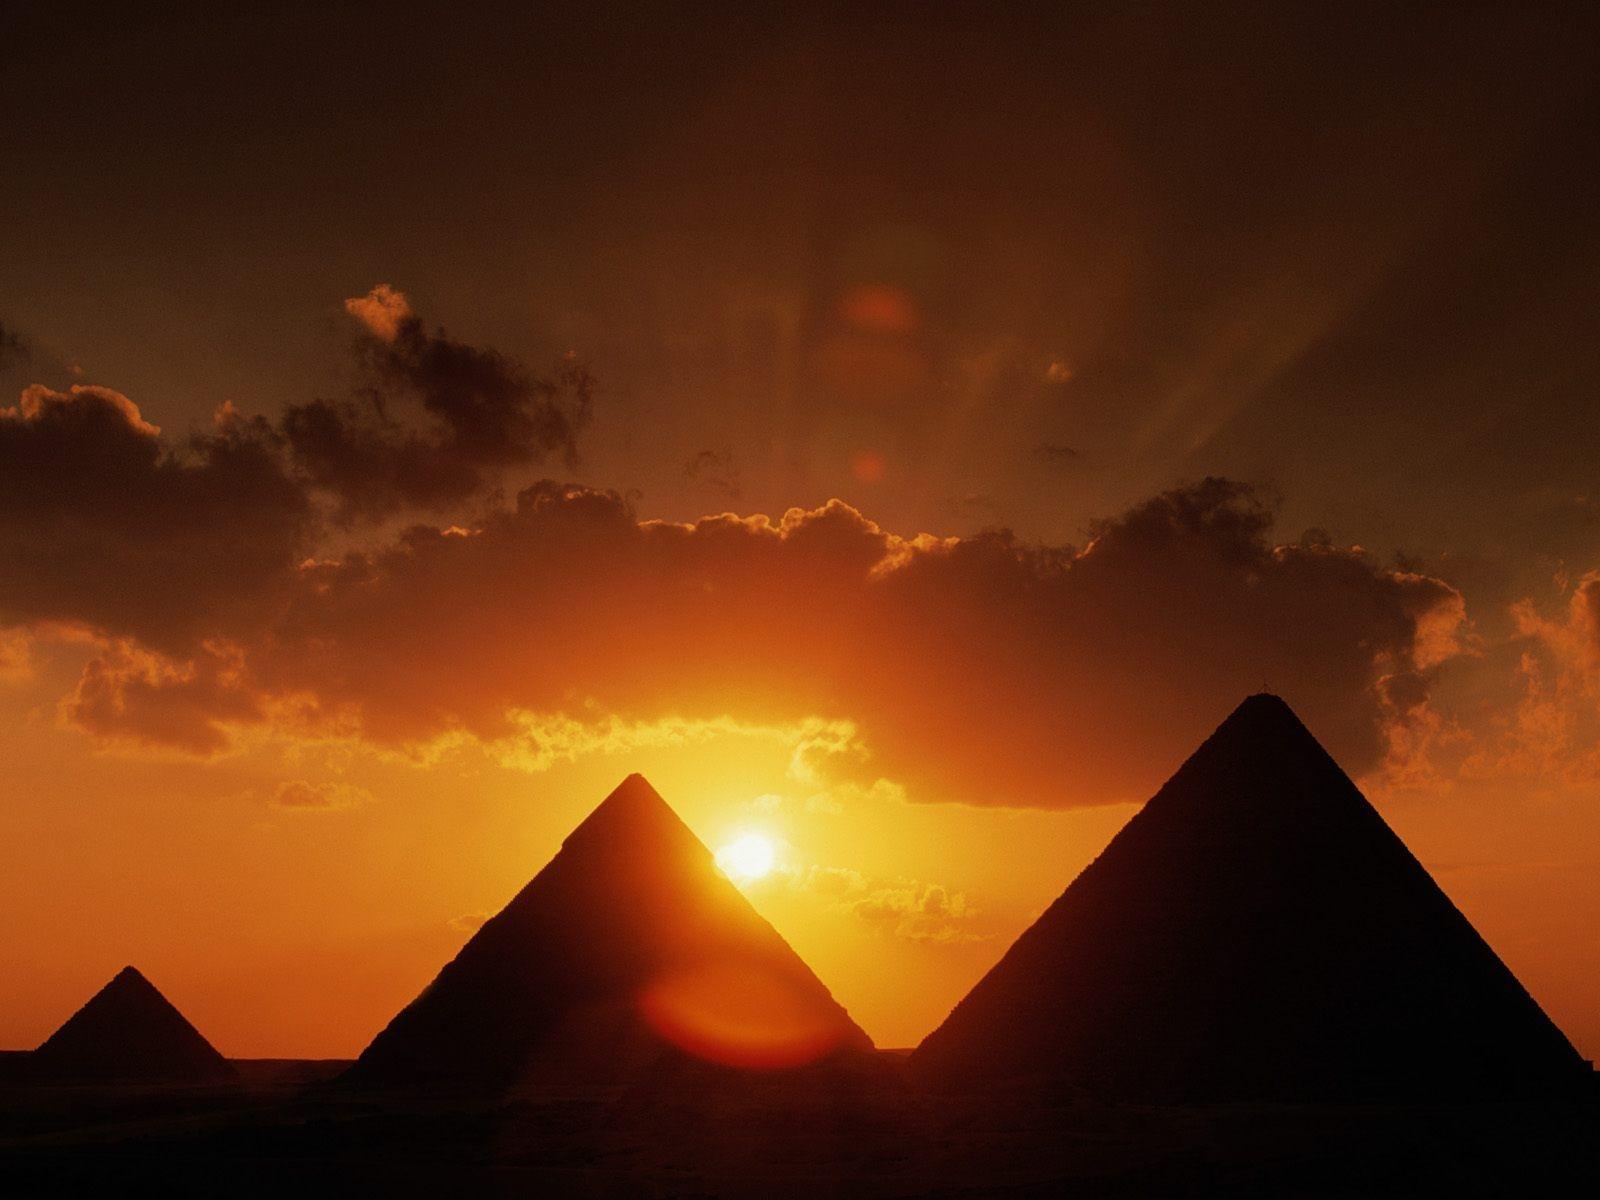 egypt hd background